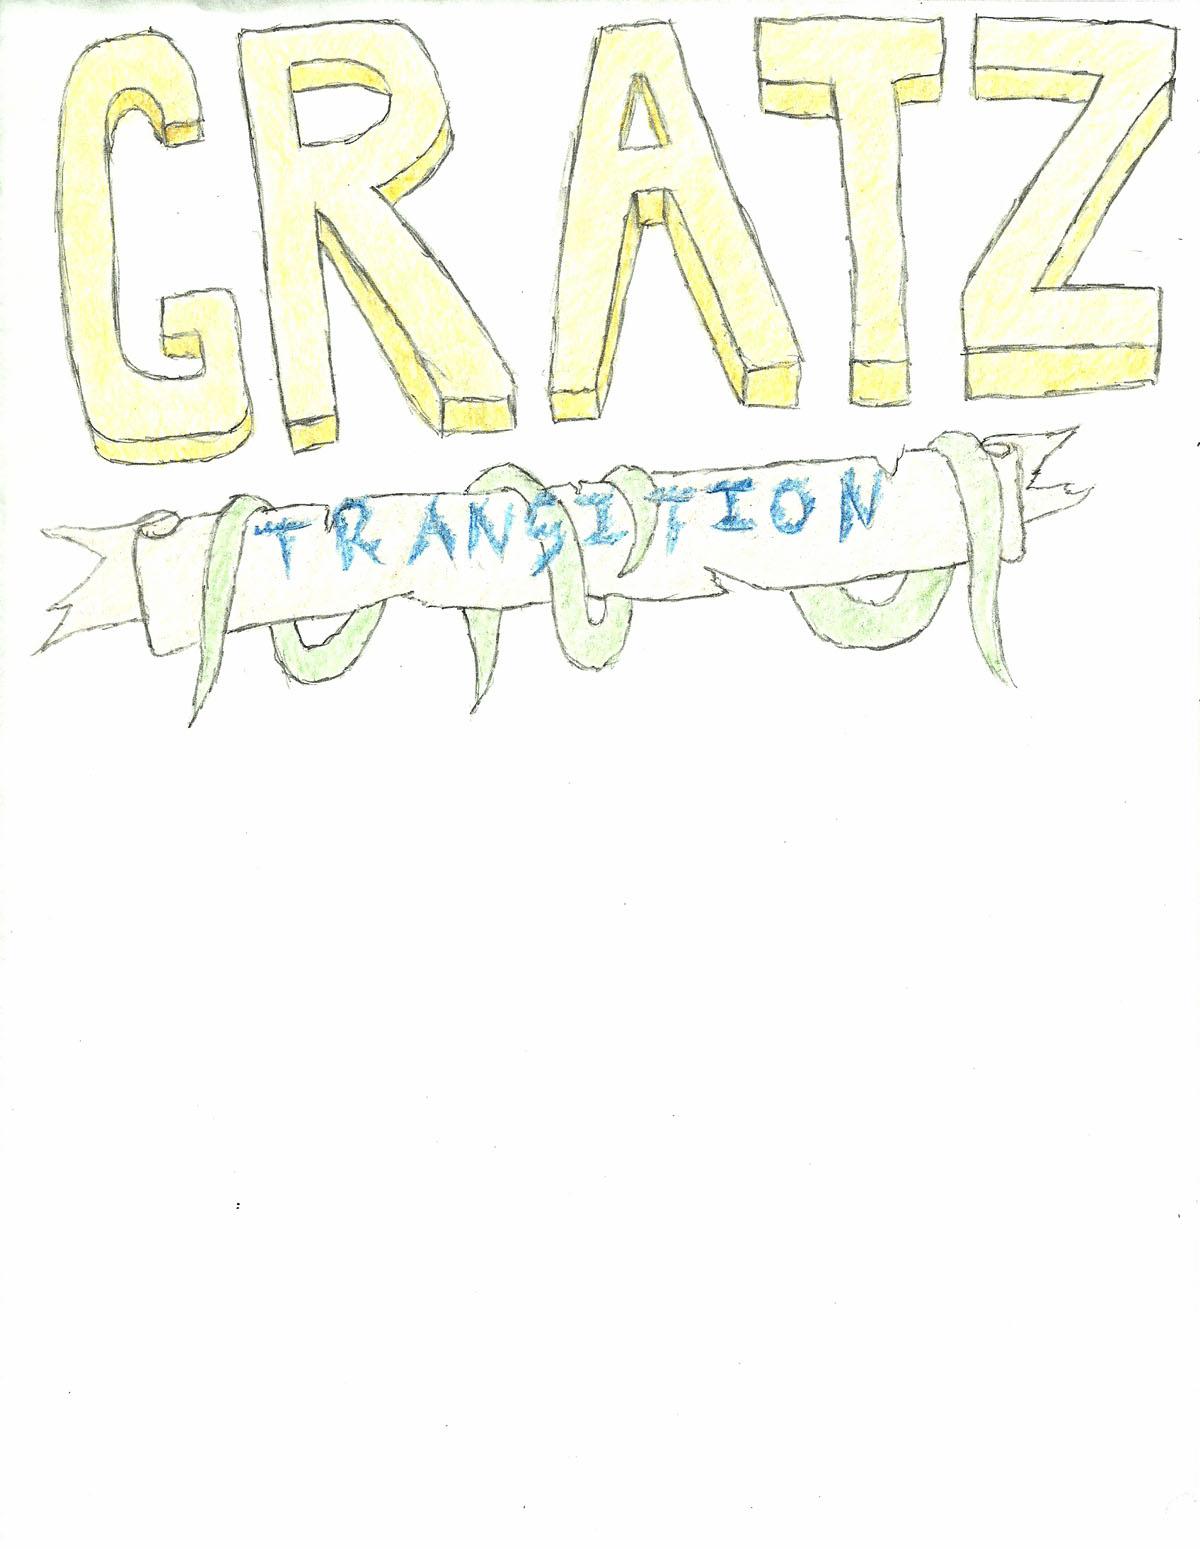 Gratz Transition